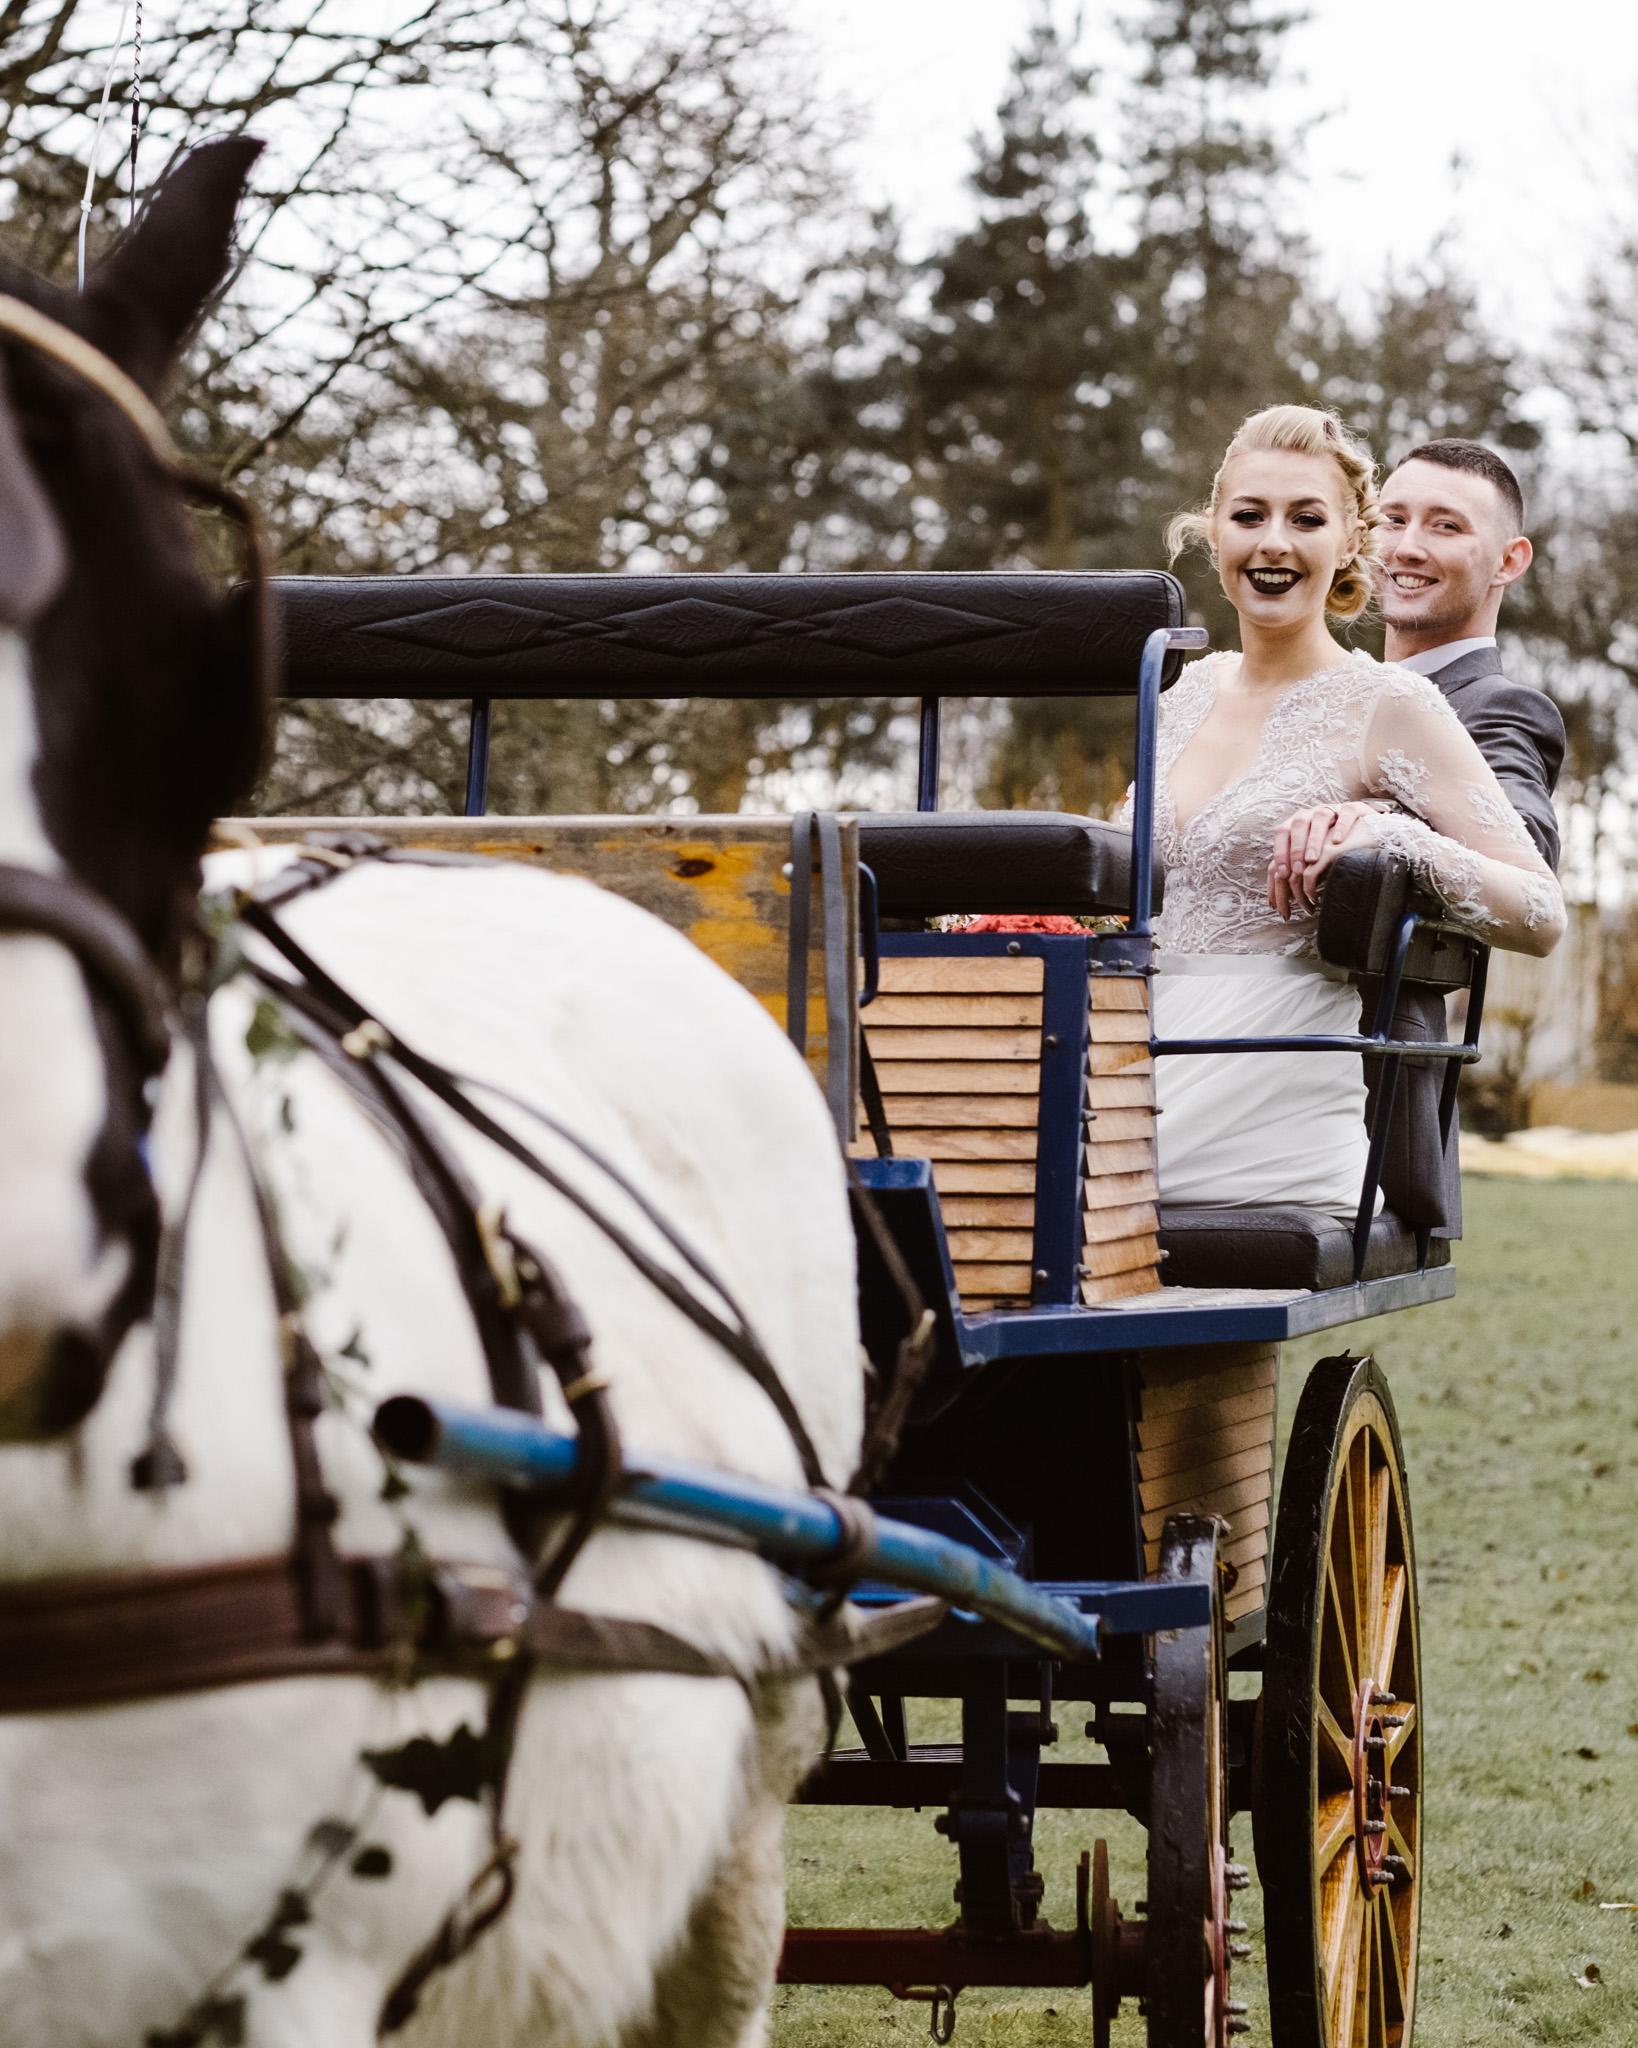 Captains-Wood-Barn-Alterative-Rustic-Vintage-Essex-Wedding-Suffolk-Grace-Elizabeth-2.jpg